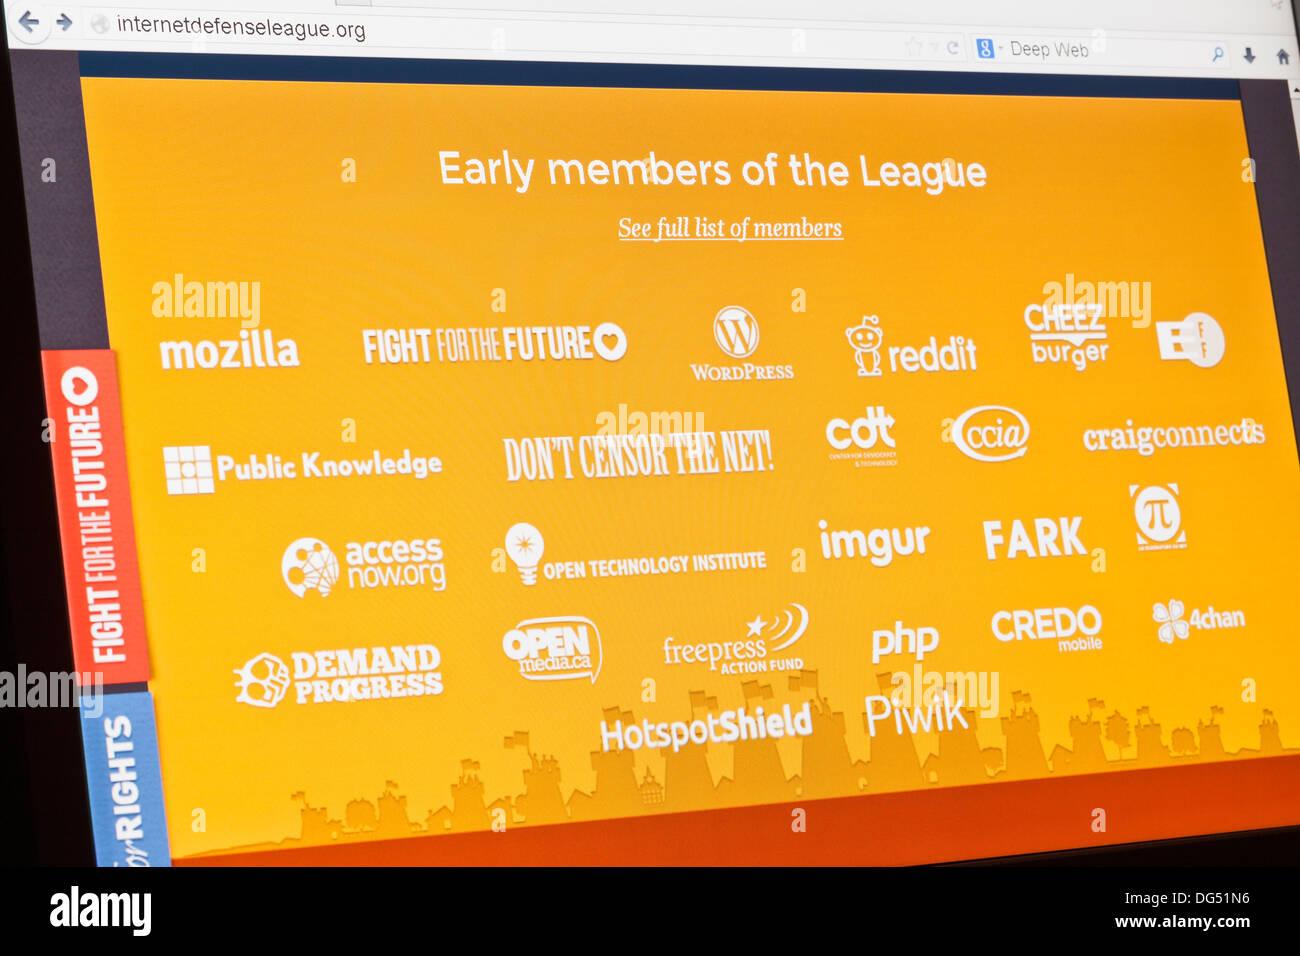 Screenshot of the internet defense league homepage - Stock Image